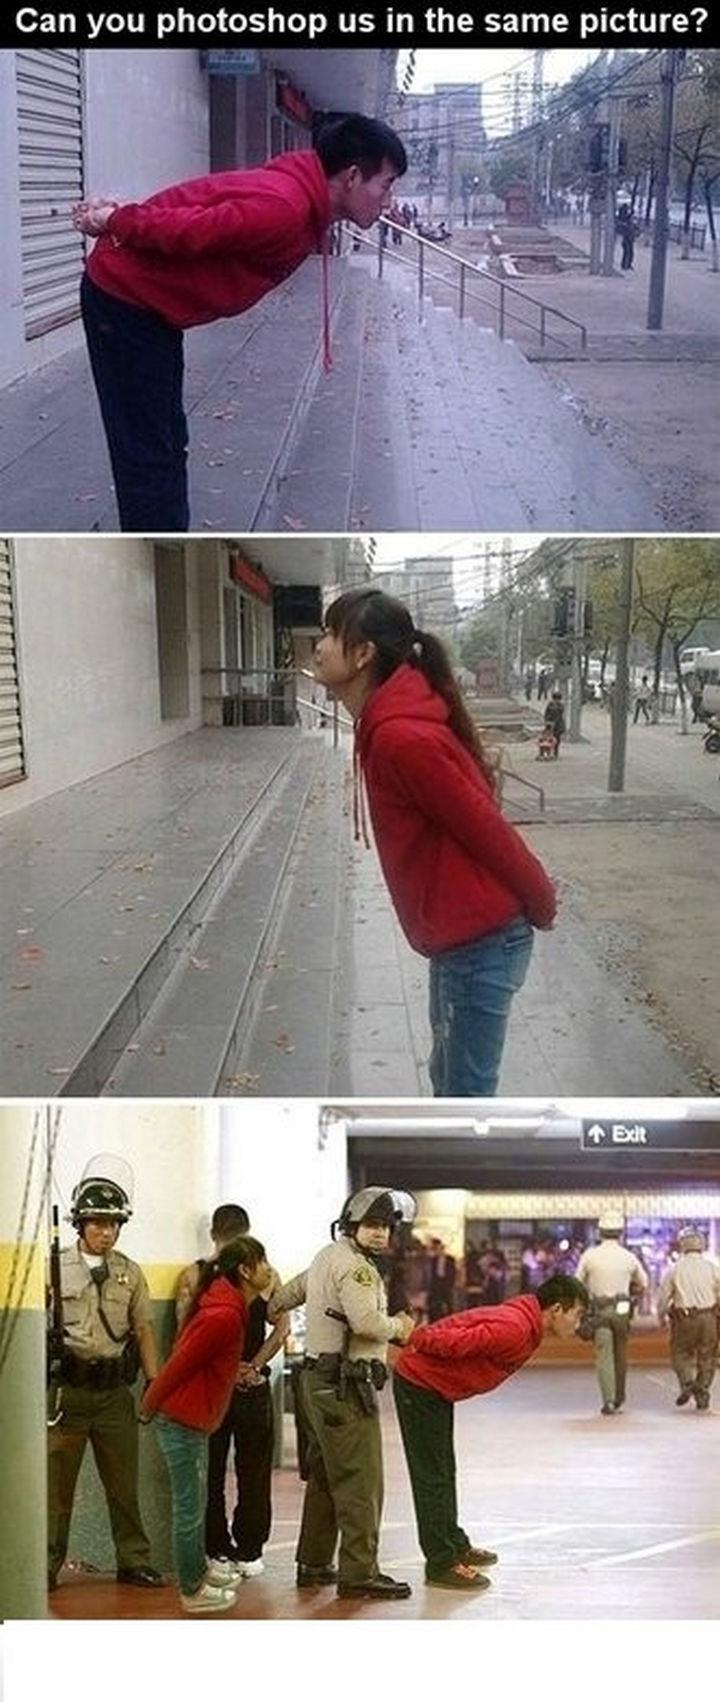 25 Funny Photoshop Trolls - No problem, here you go!